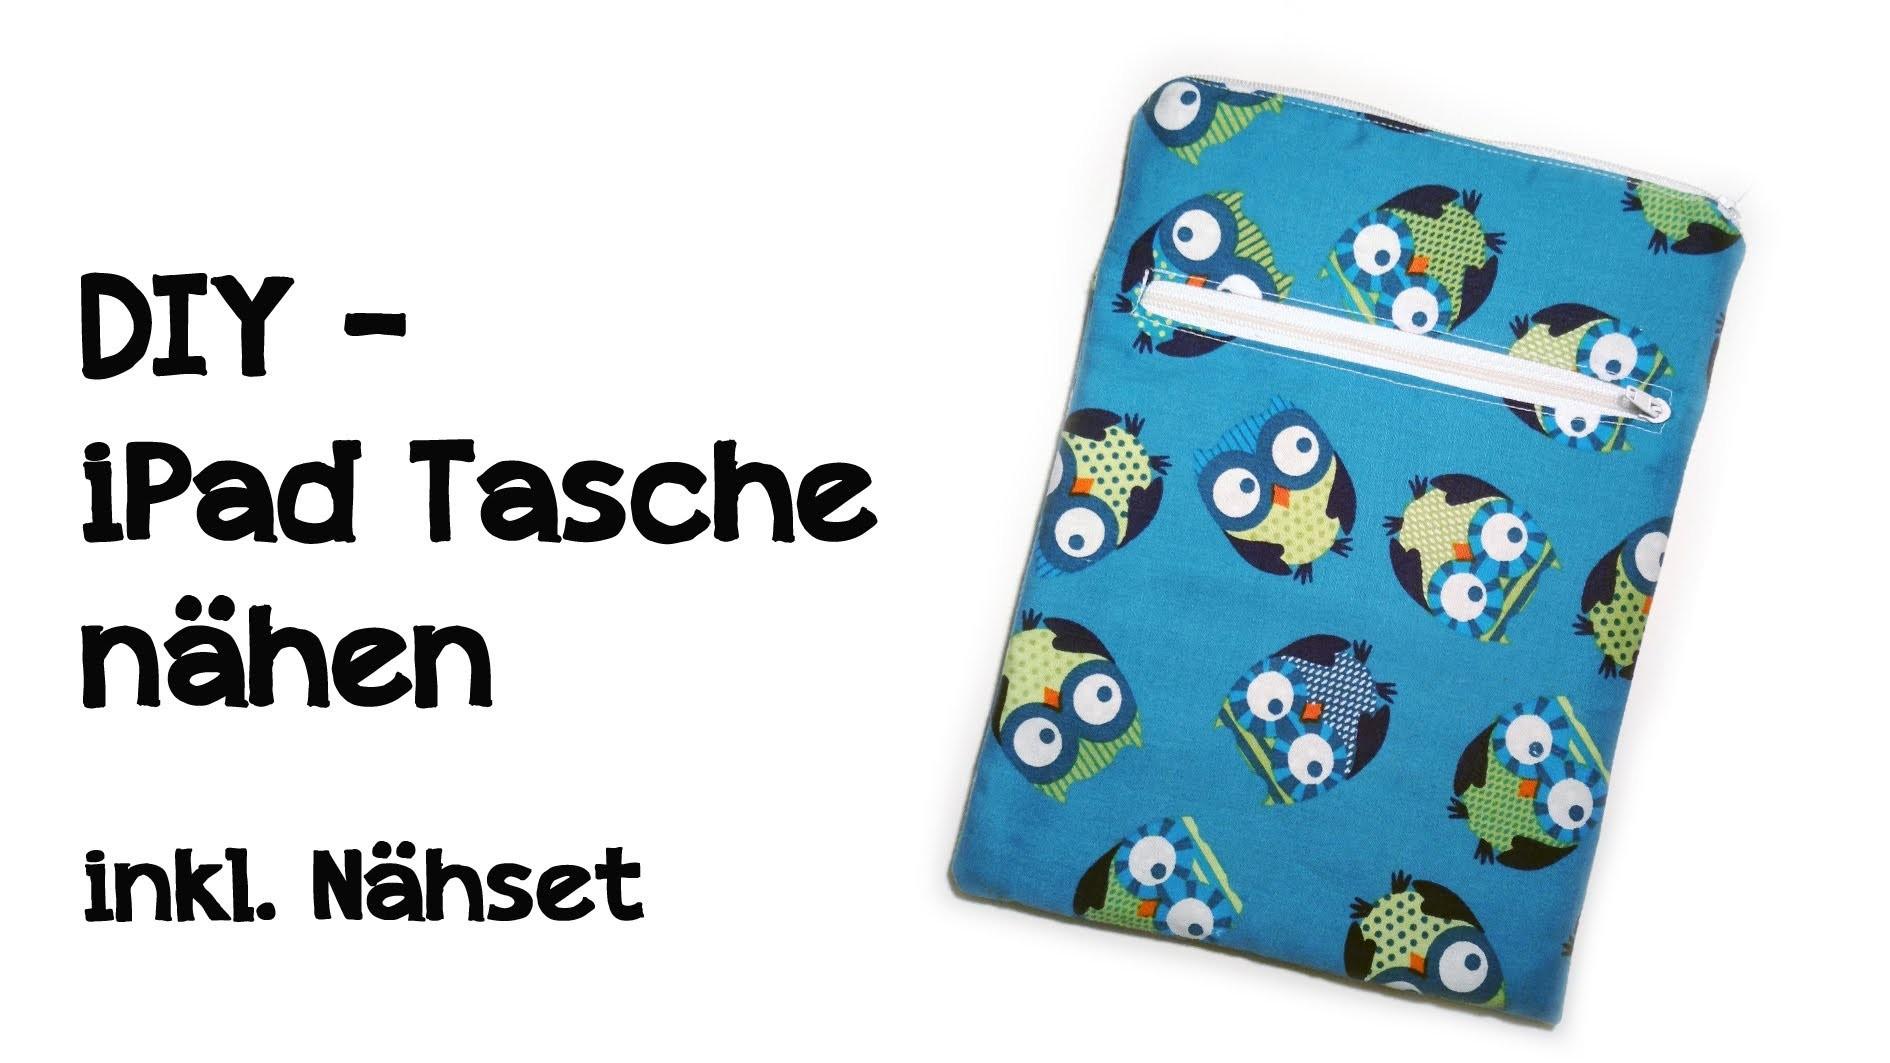 DIY - iPad Tasche. kindle Tasche nähen - inkl. Nähset zum nachmachen!